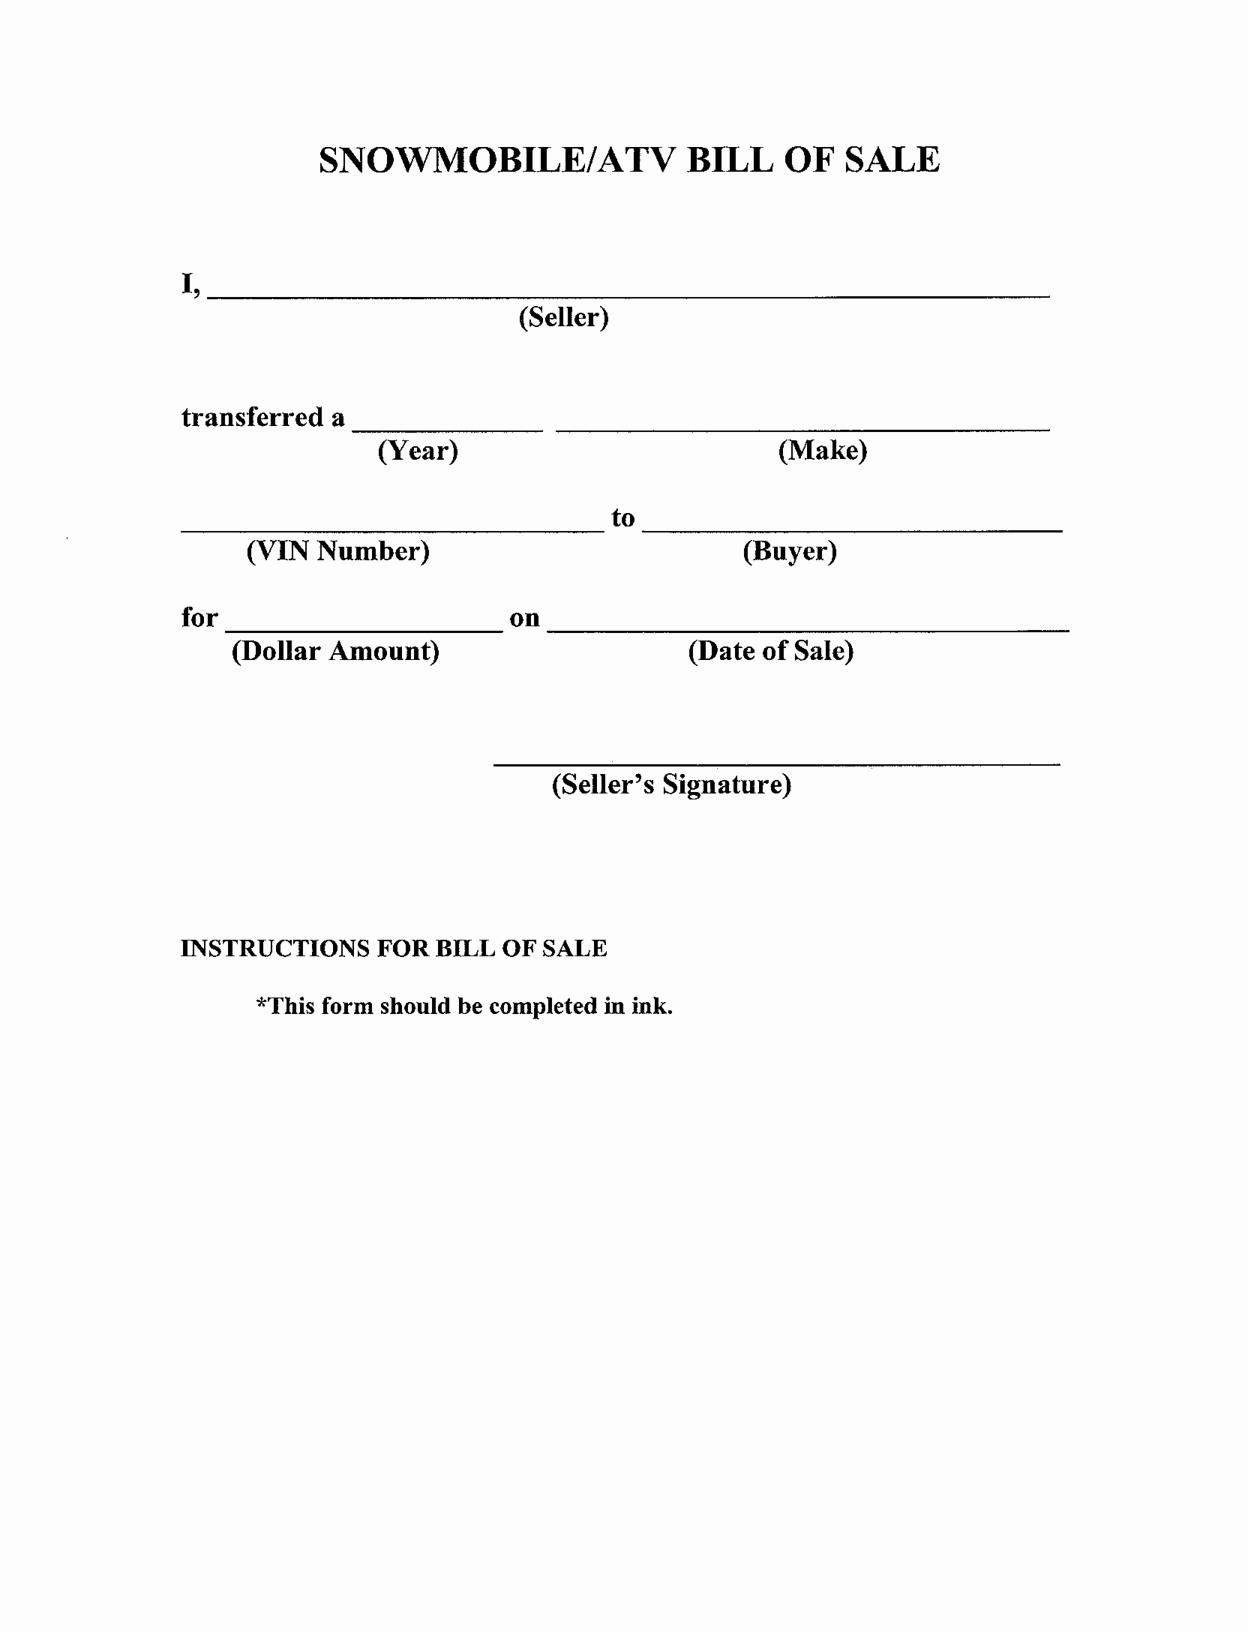 Bill Of Sale Sample form Elegant Free Printable Bill Of Sale Templates form Generic